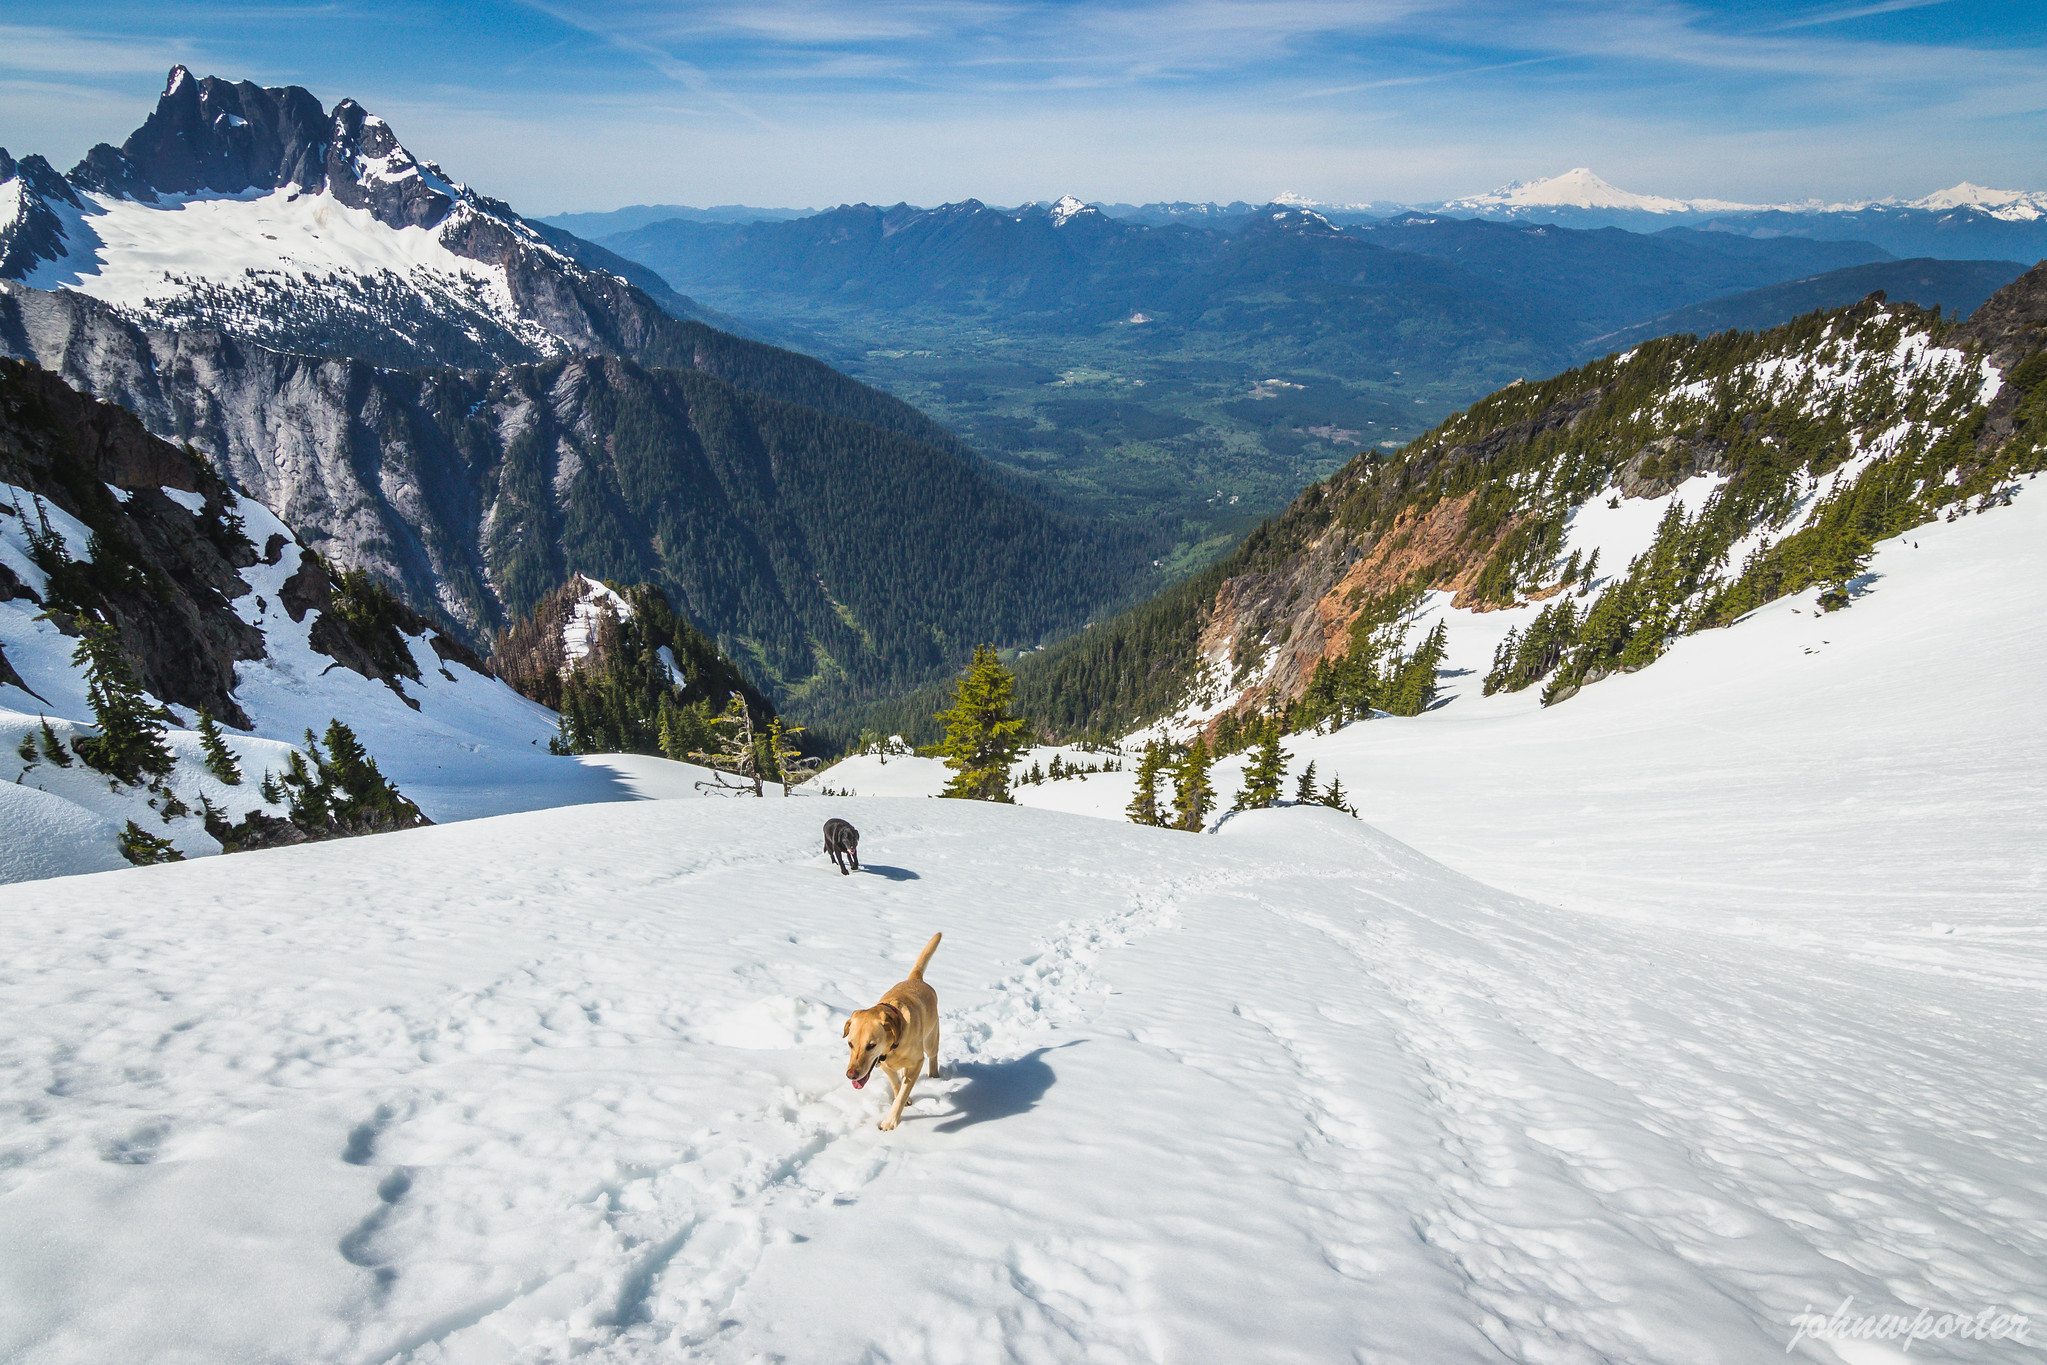 The final stretch below Jumbo Mountain